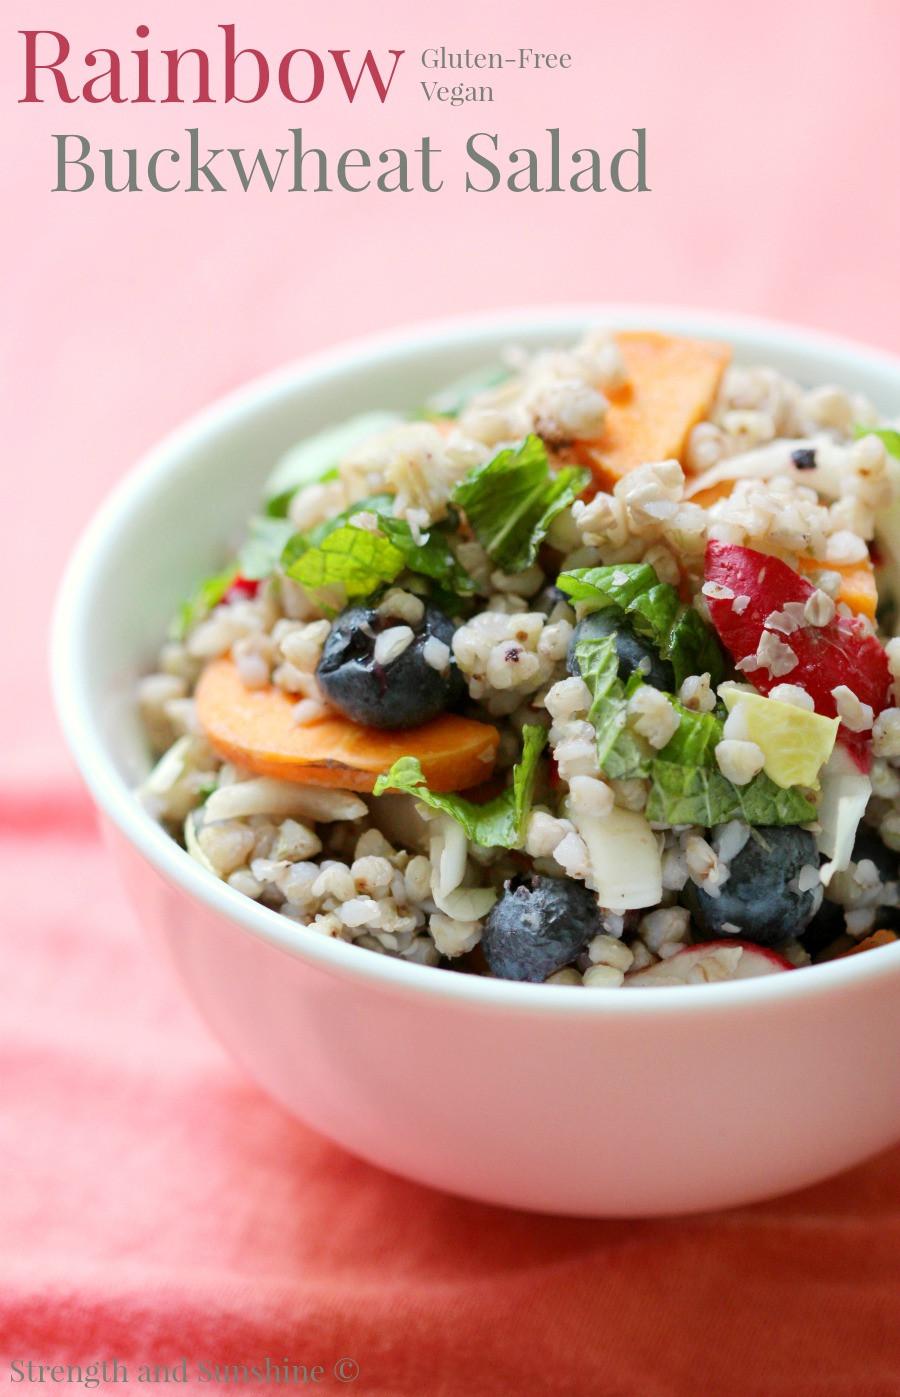 Gluten Free Side Dishes Summer  Rainbow Buckwheat Salad